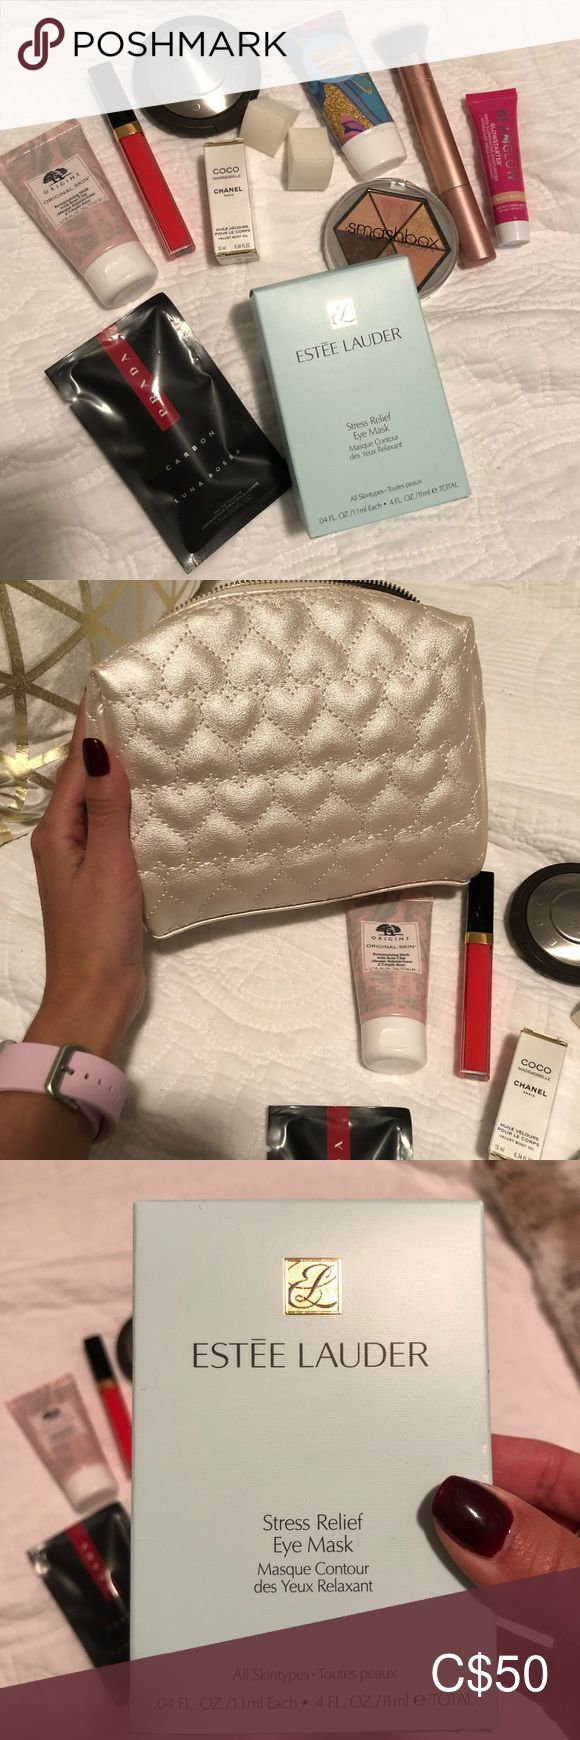 Makeup surprise bag Champagne pop highlighter, Goodie